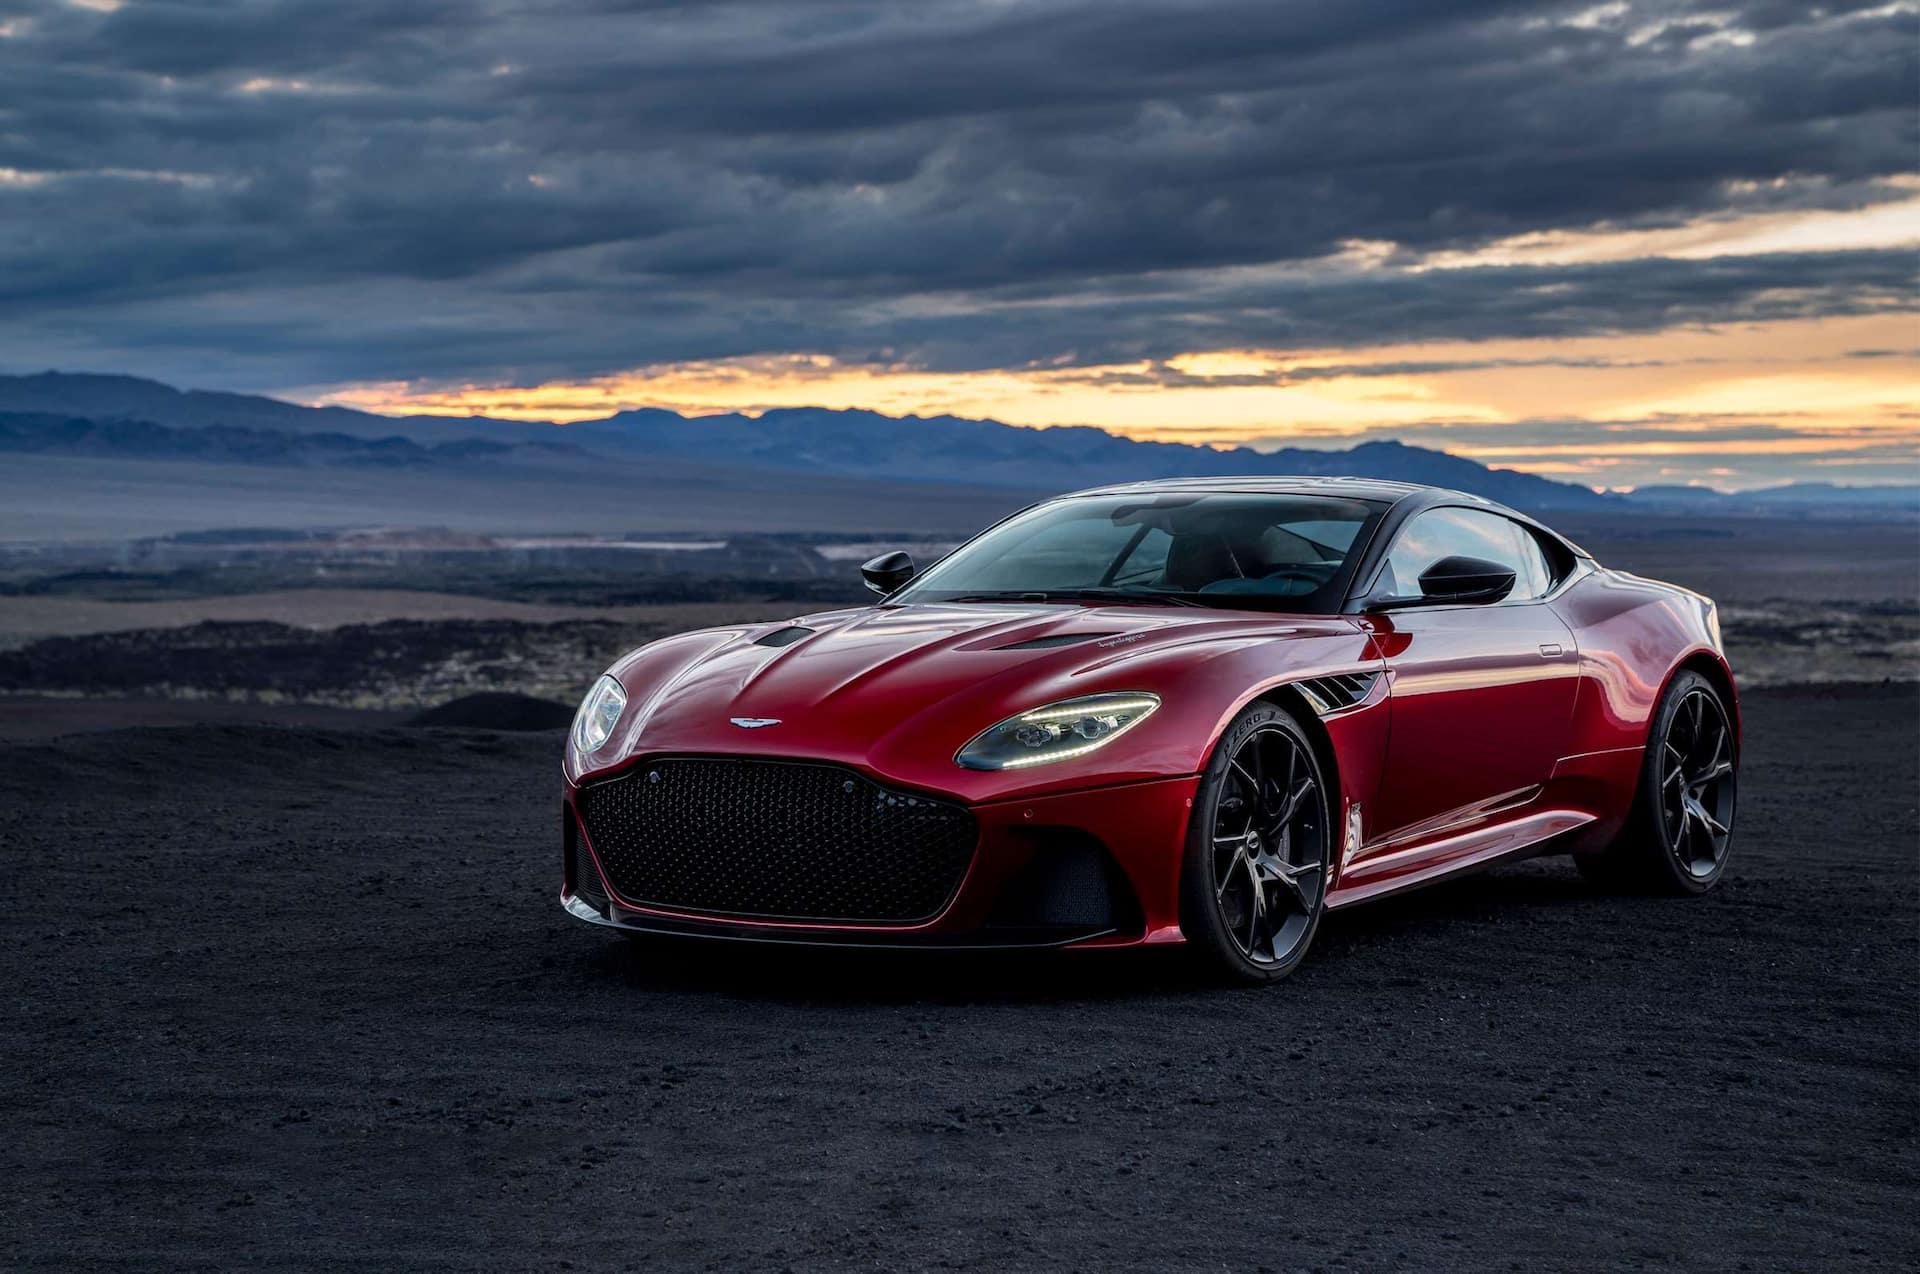 2019 Aston Martin Dbs Superleggera For Sale In Minneapolis Mn